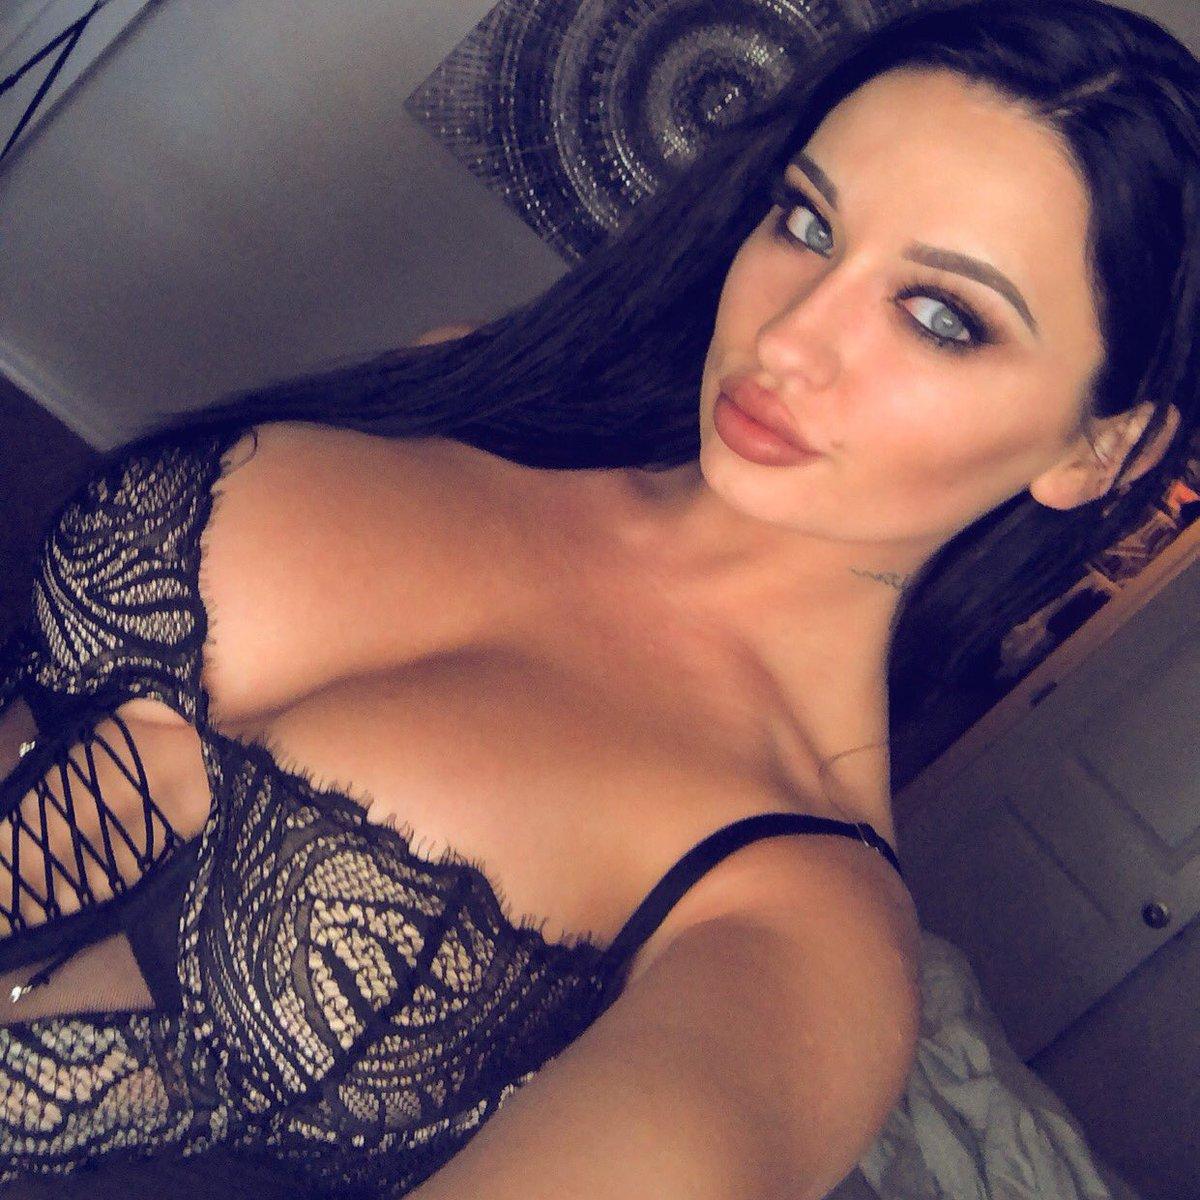 Living my best life in my best lingerie ✨ FsBambtmfY